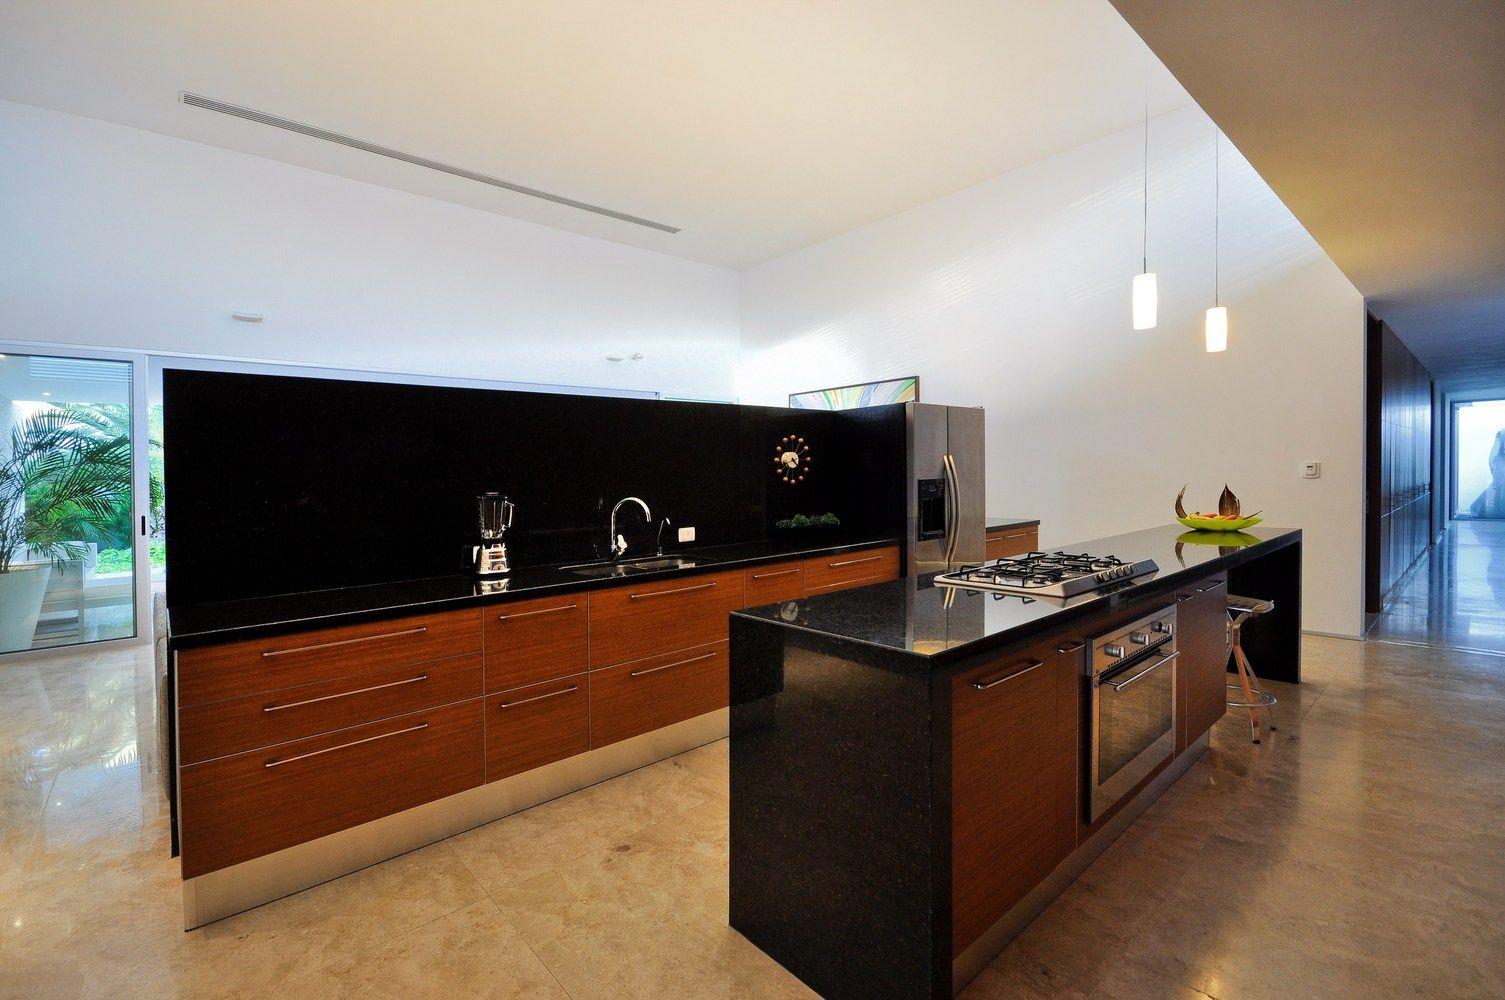 Gallery of Rajuela House / Muñoz Arquitectos - 16